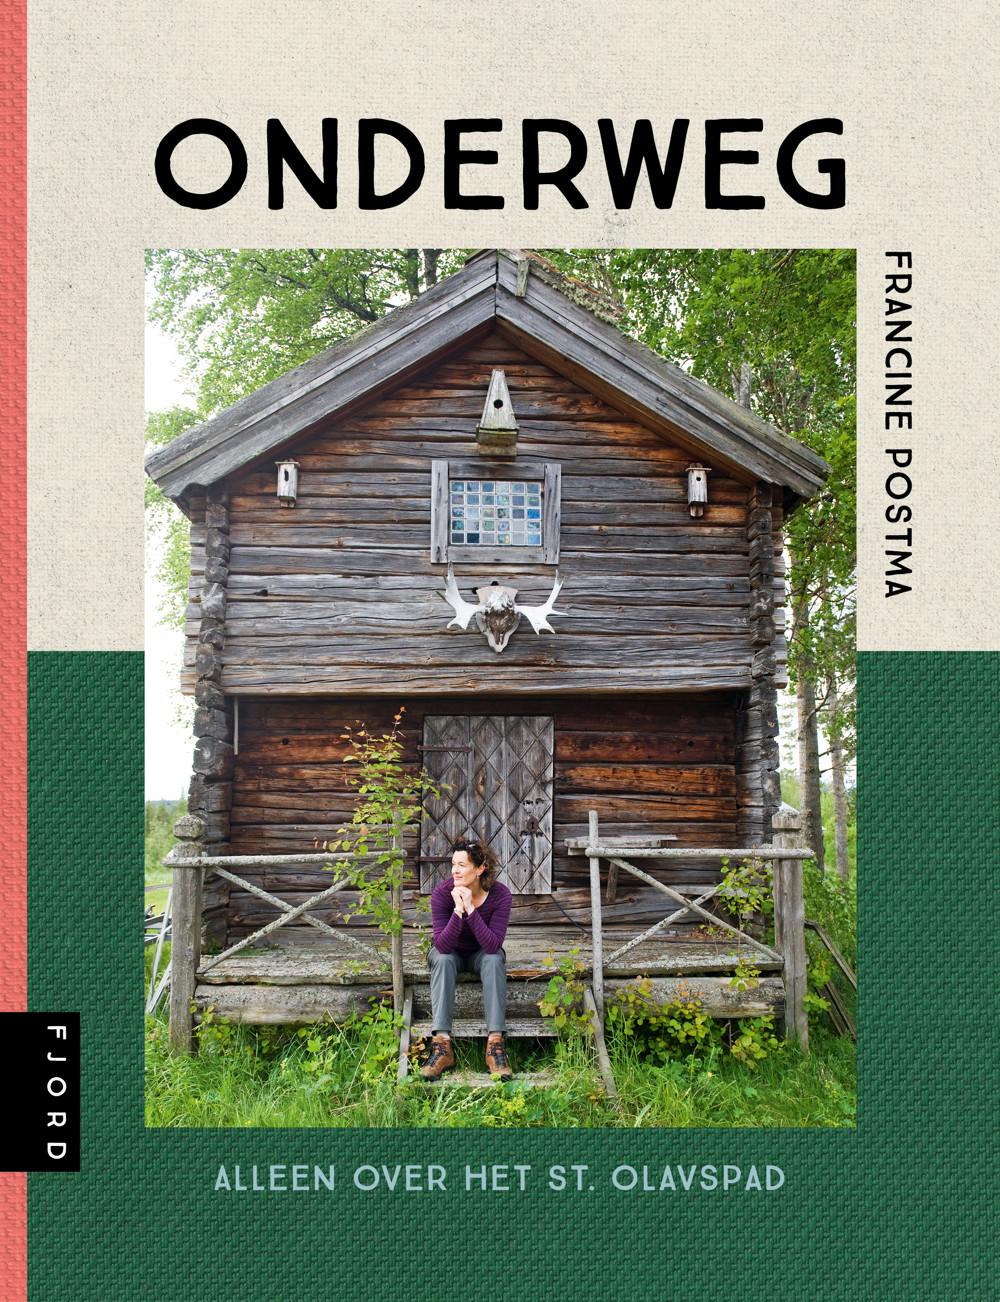 Boek - ONDERWEG Francine Postma, alleen over de St Olavs wandelroute